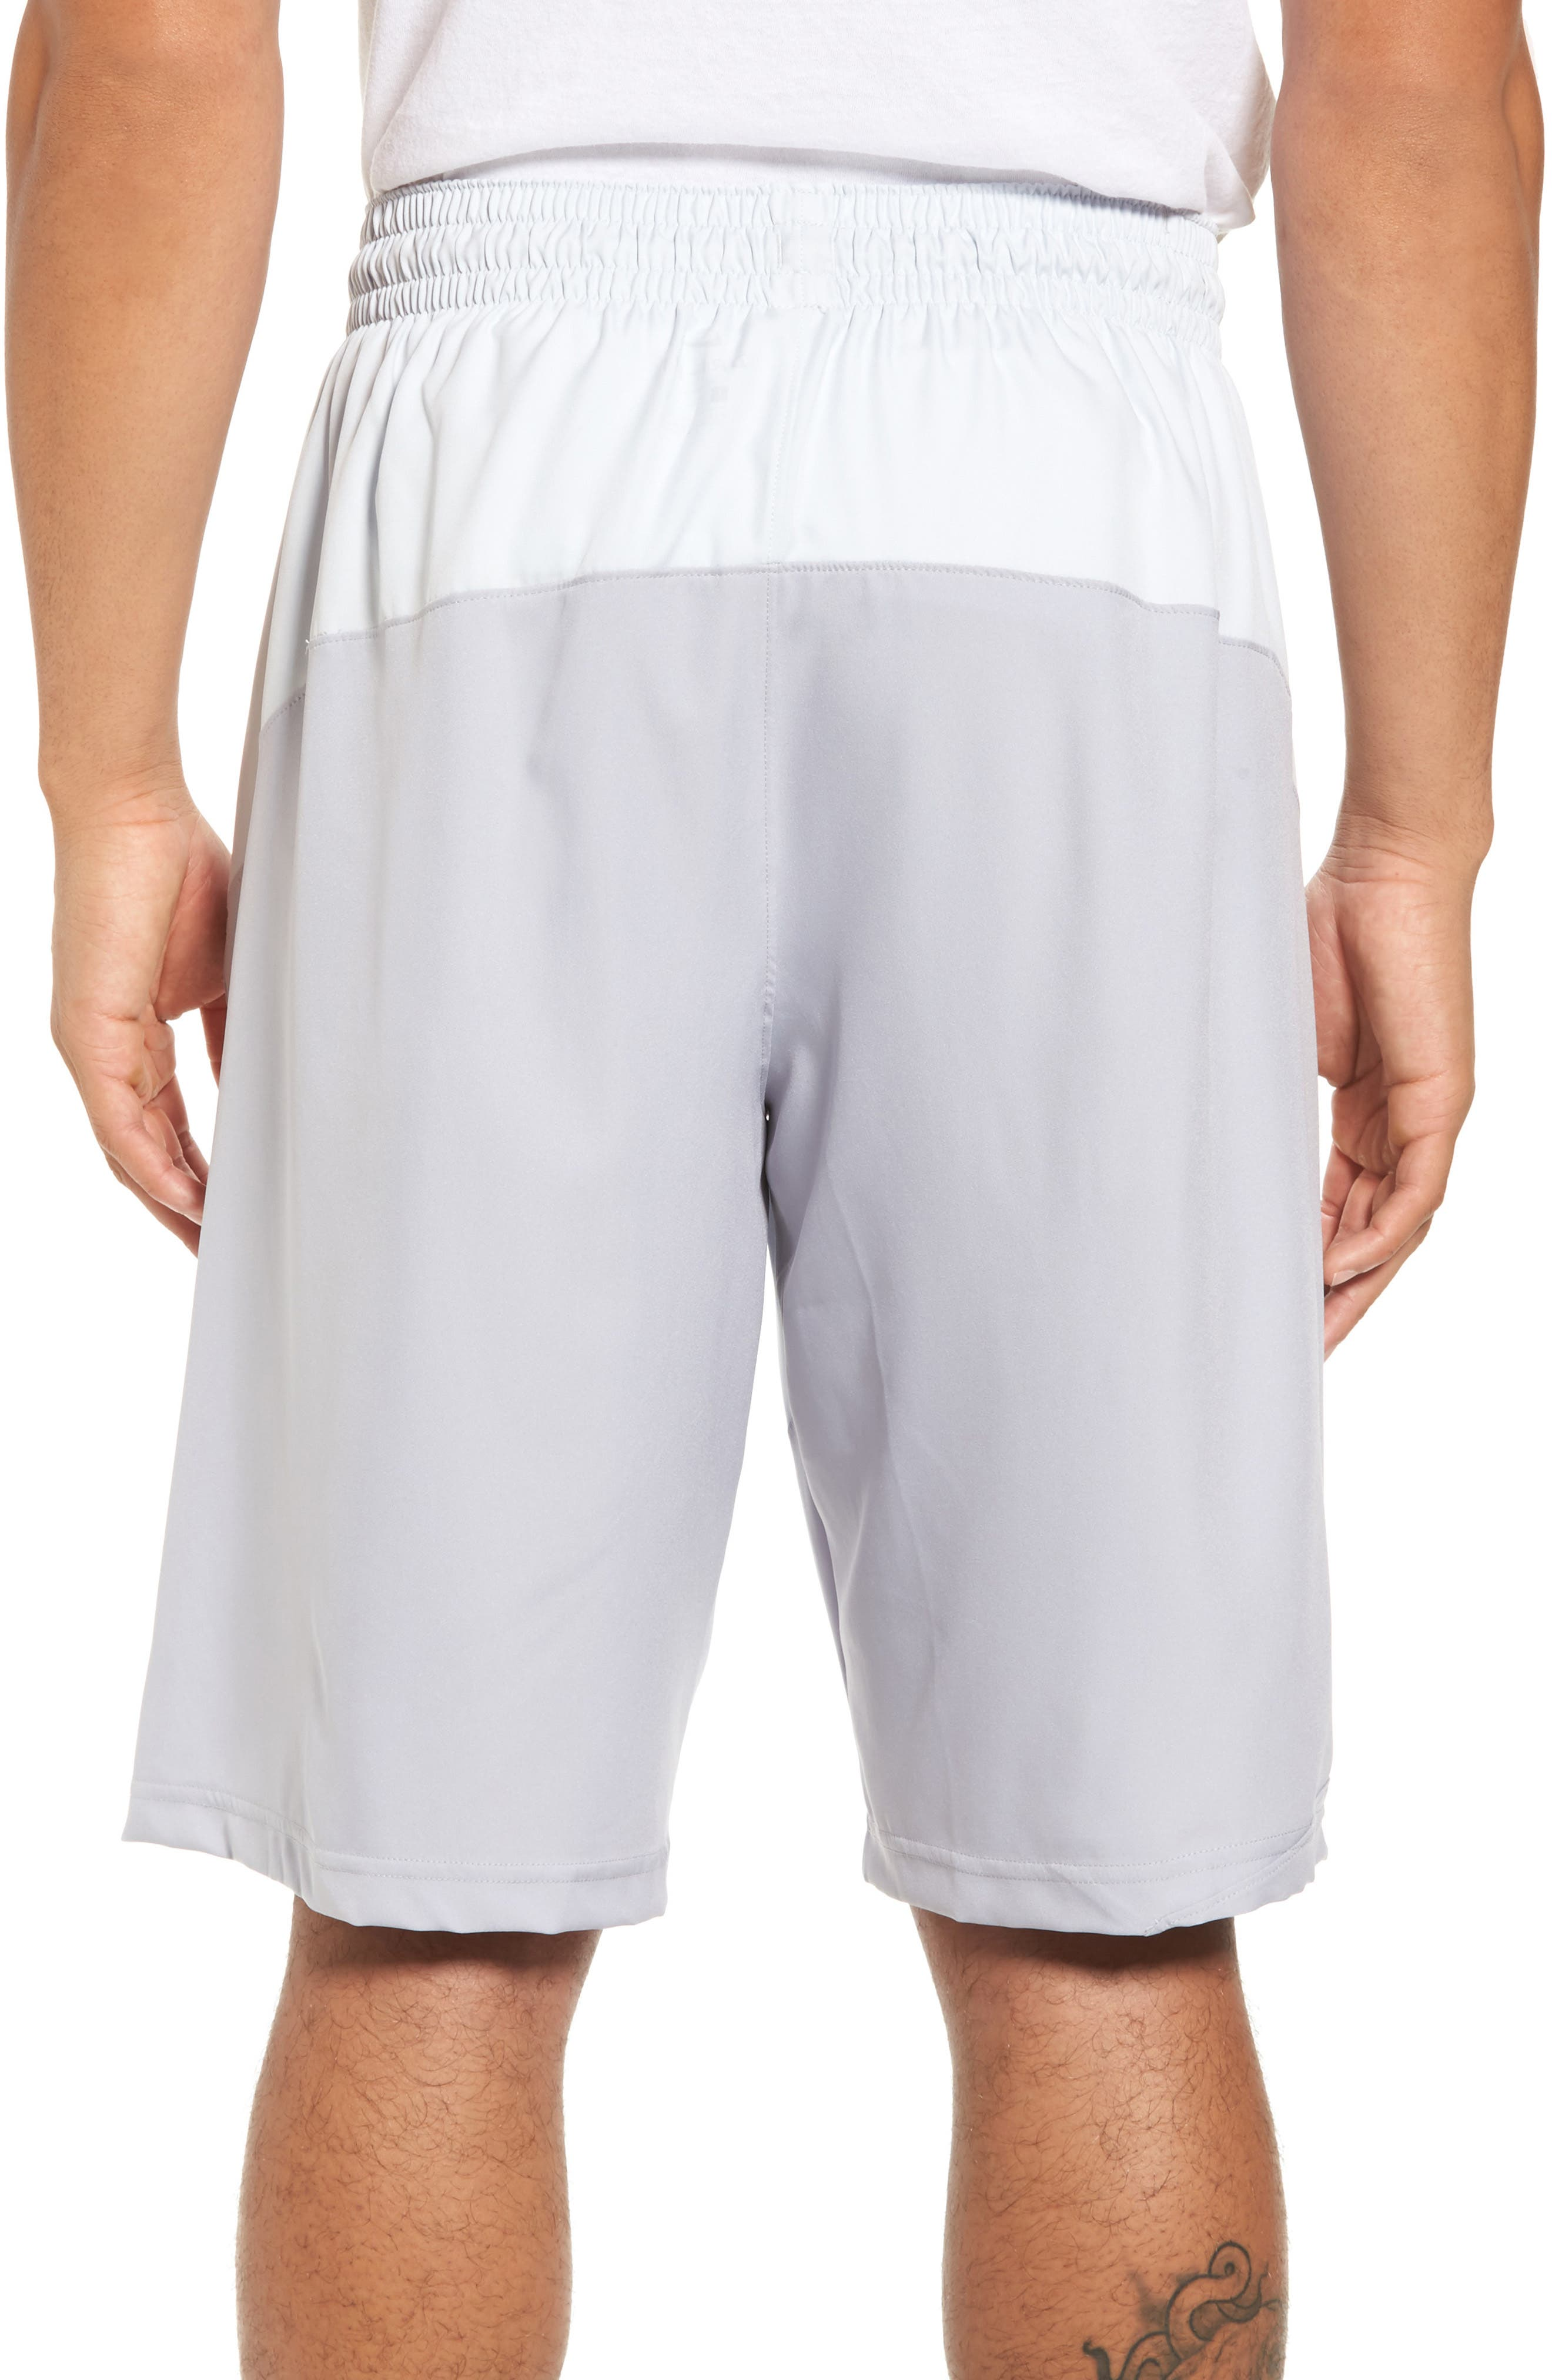 Dry Shorts,                             Alternate thumbnail 2, color,                             Atmosphere Grey/ Smoke/ Black